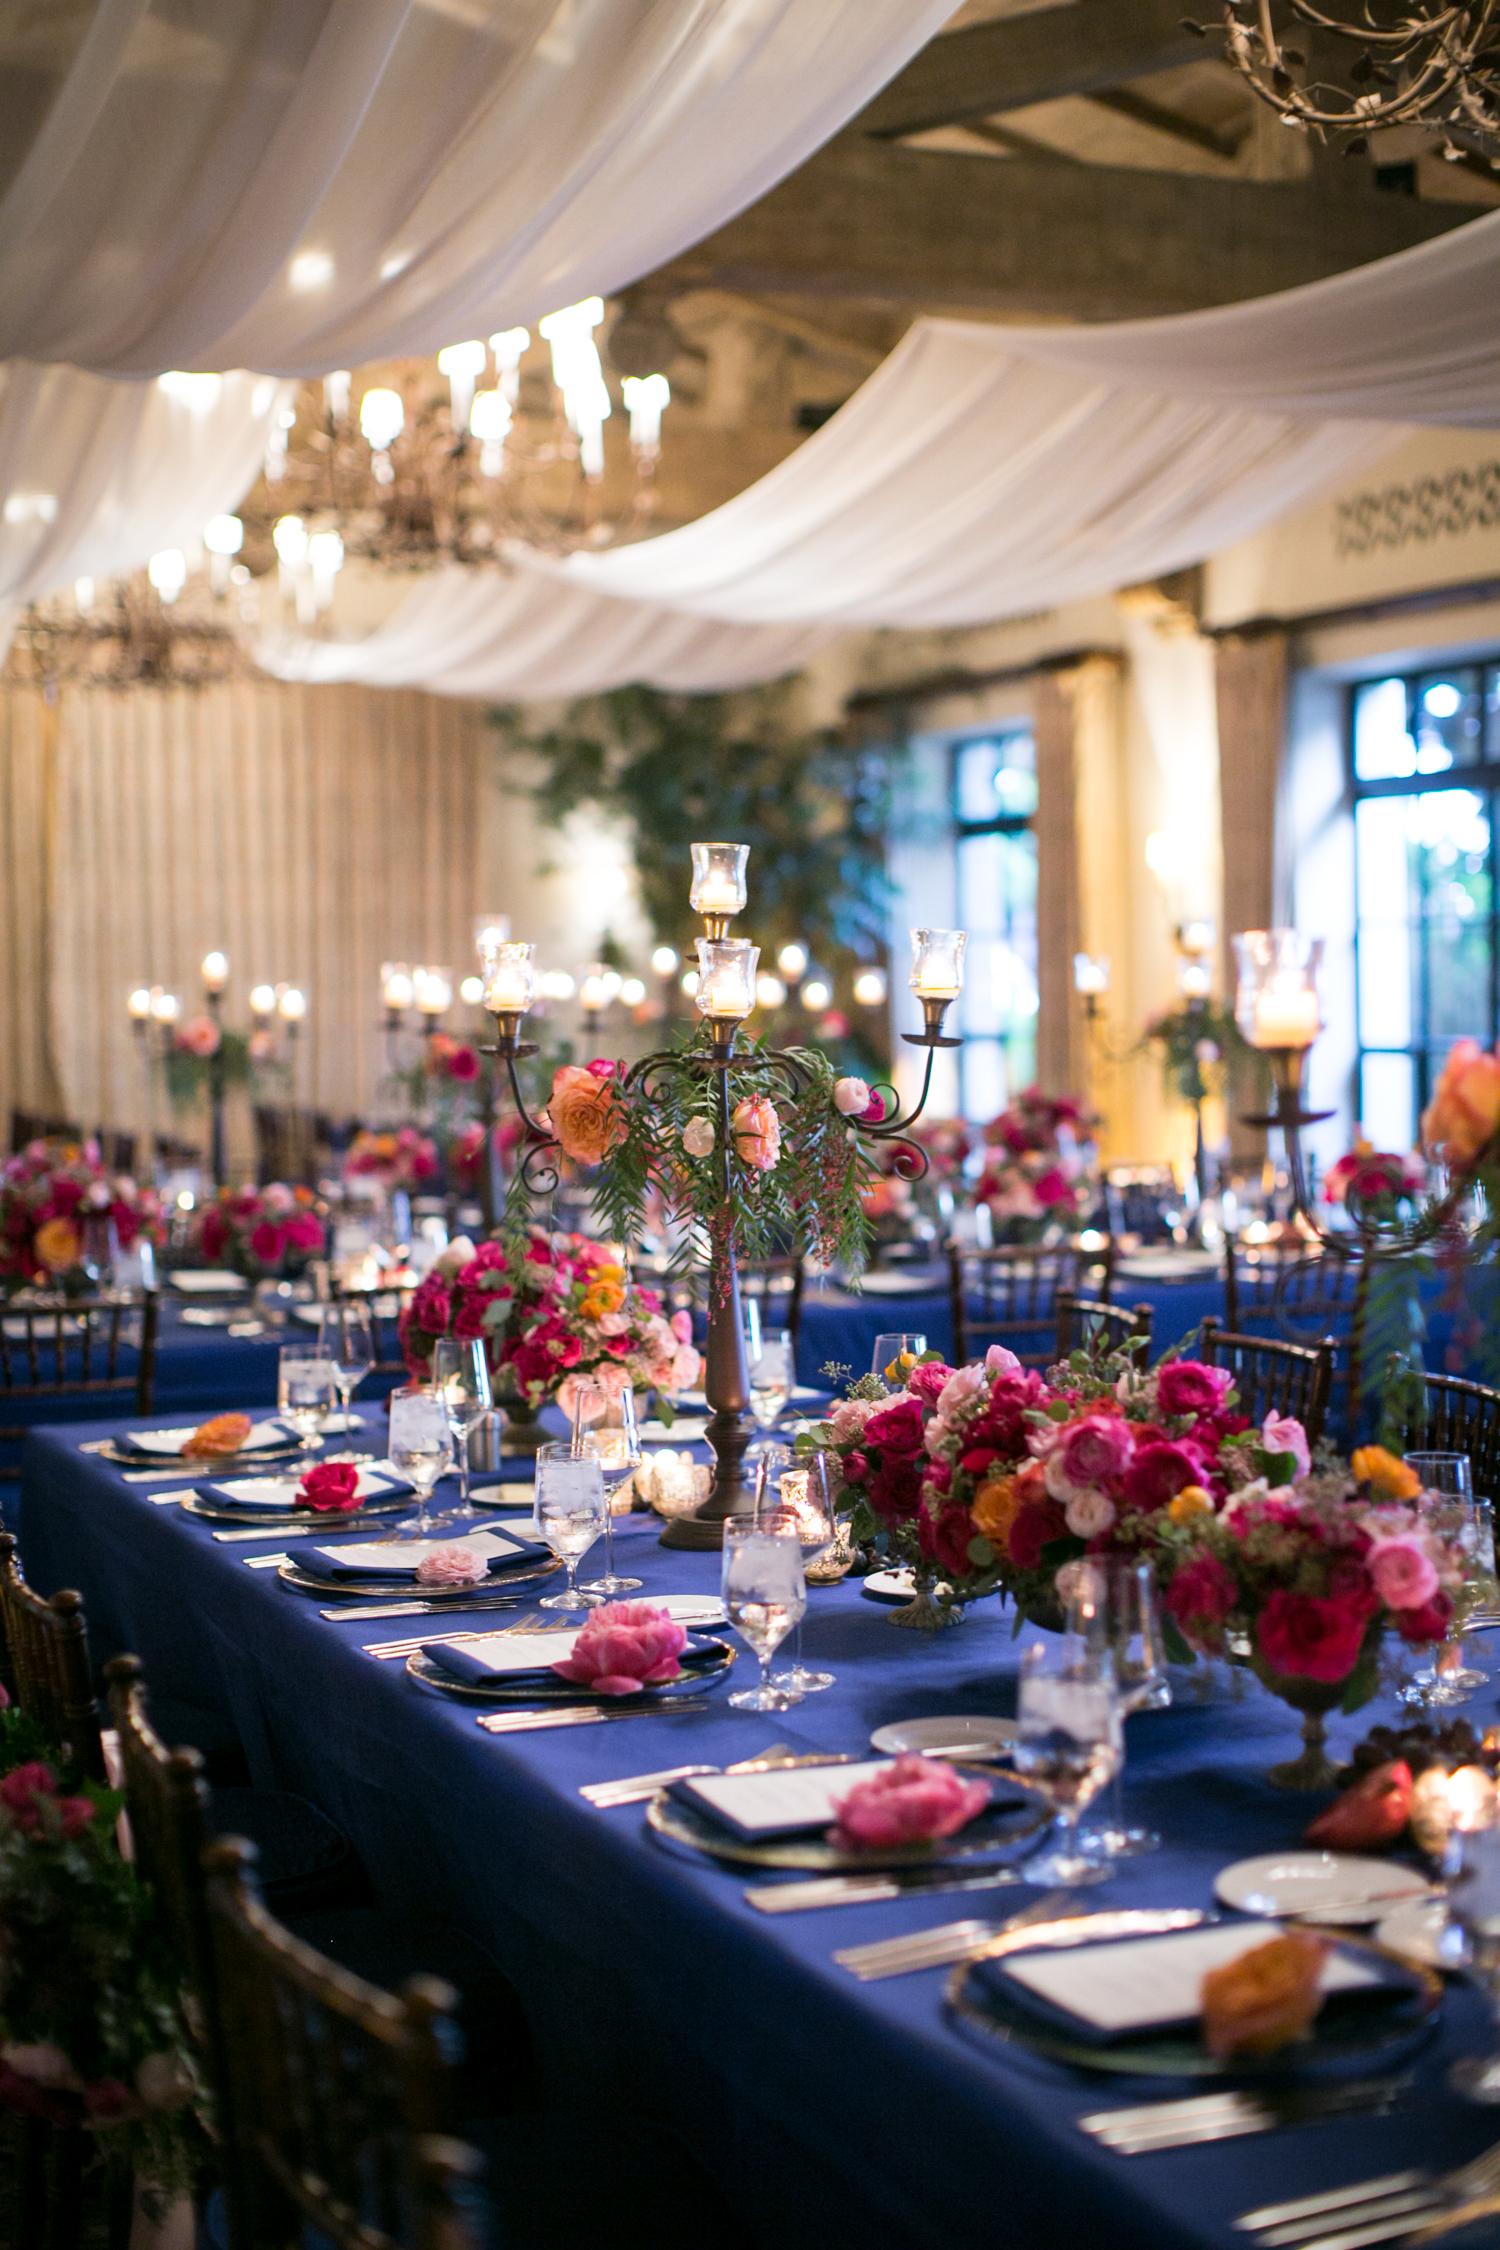 www.santabarbarawedding.com | Miki & Sonja Photography | Four Seasons Resort The Biltmore | Imagine Weddings & Special Events | La Tavola Linens | Reception Tables